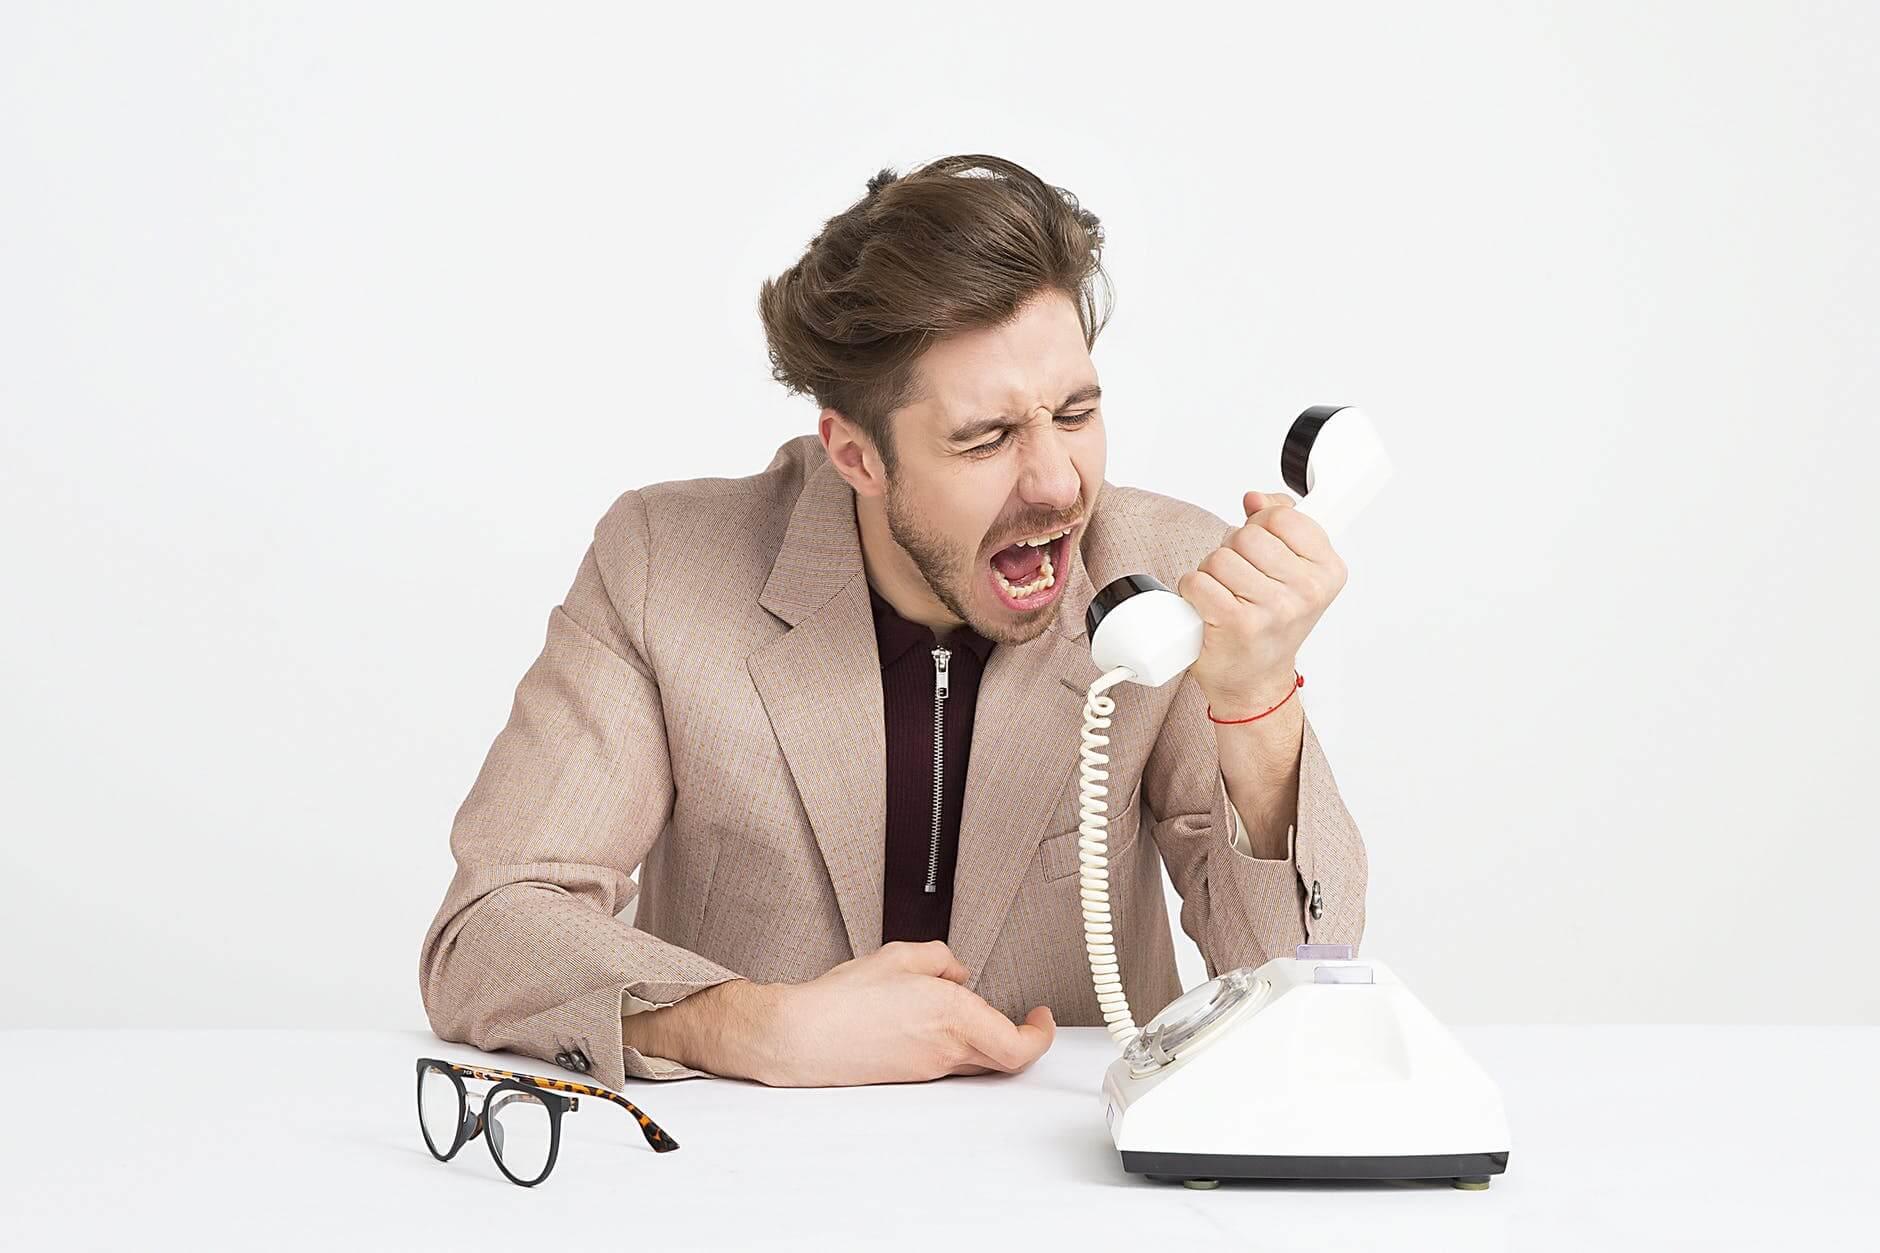 Martini, Hughes and Grossman Debt Harassment Calls?